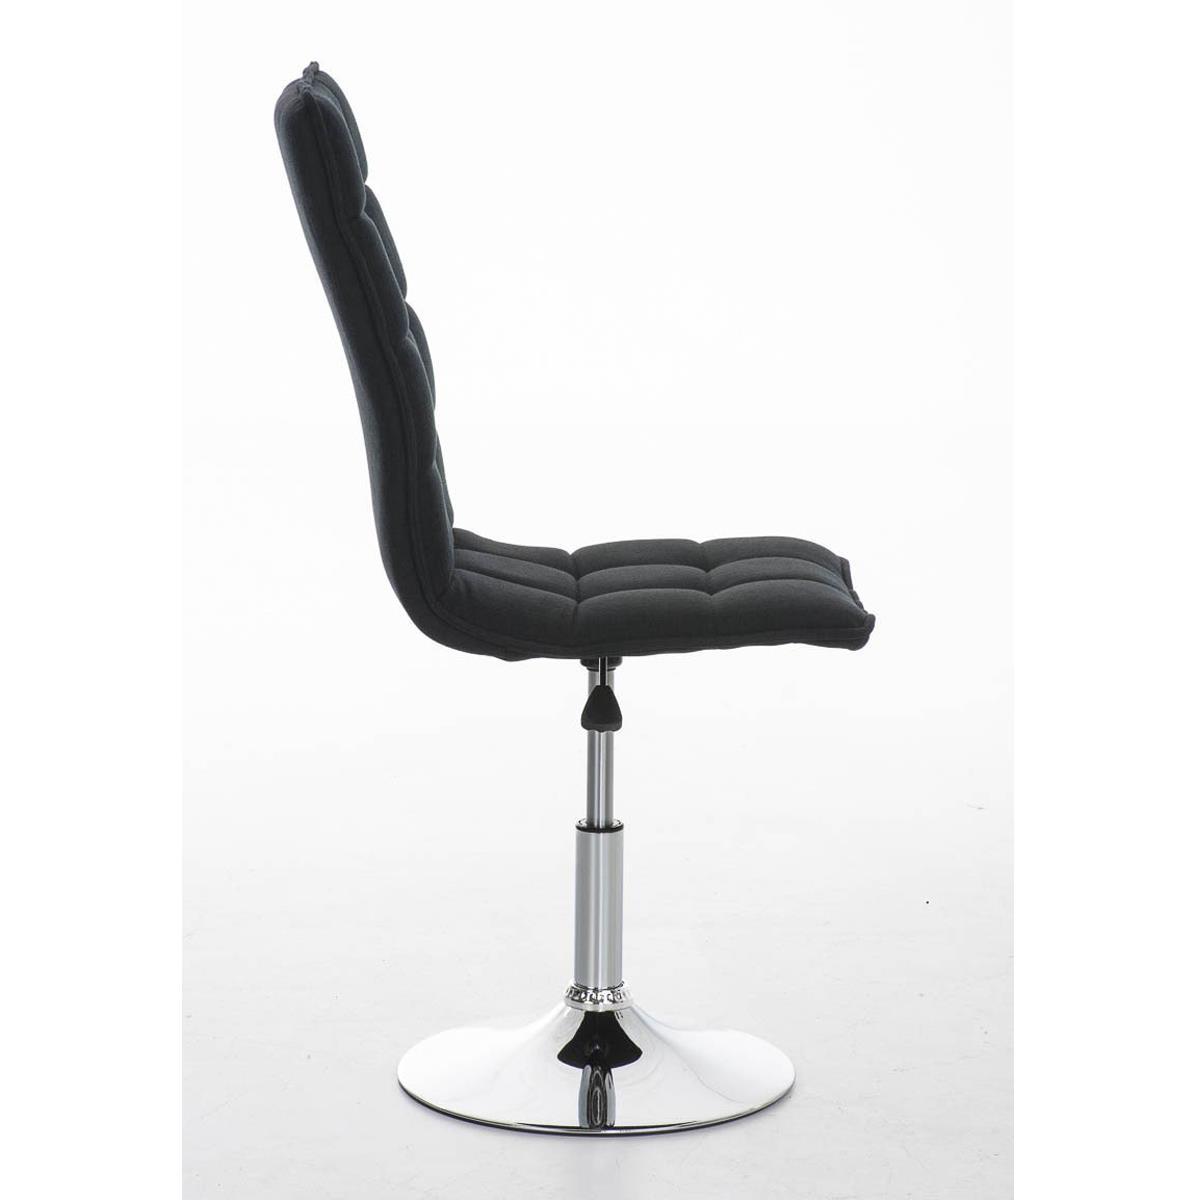 Silla de comedor o cocina pescara en tela color negro - Telas para sillas de cocina ...